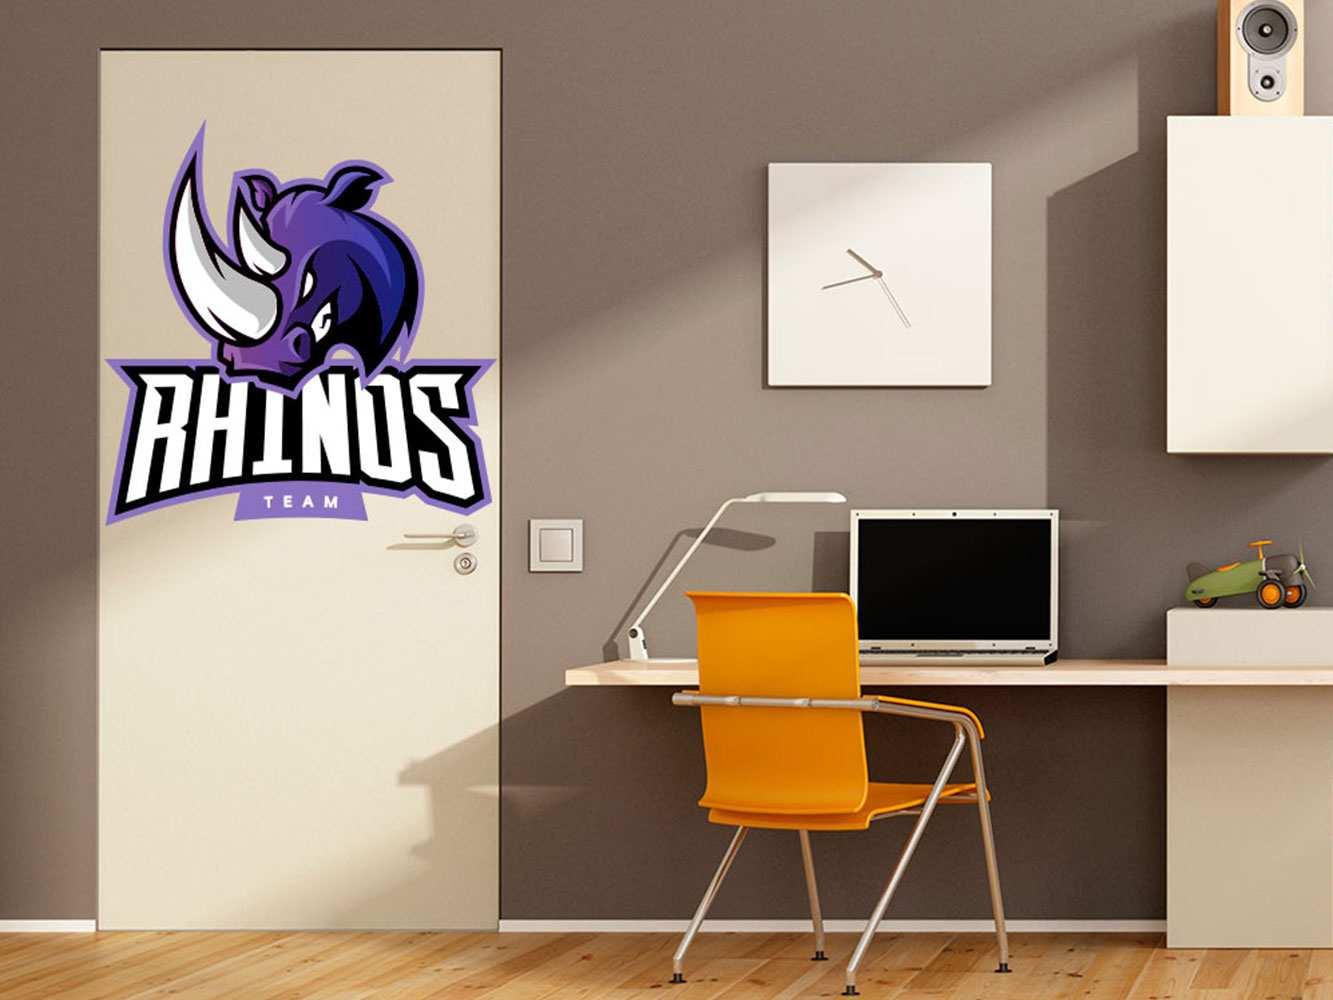 Vinilo Decorativo Puerta Rhinos Team   Carteles XXL - Impresión carteleria publicitaria